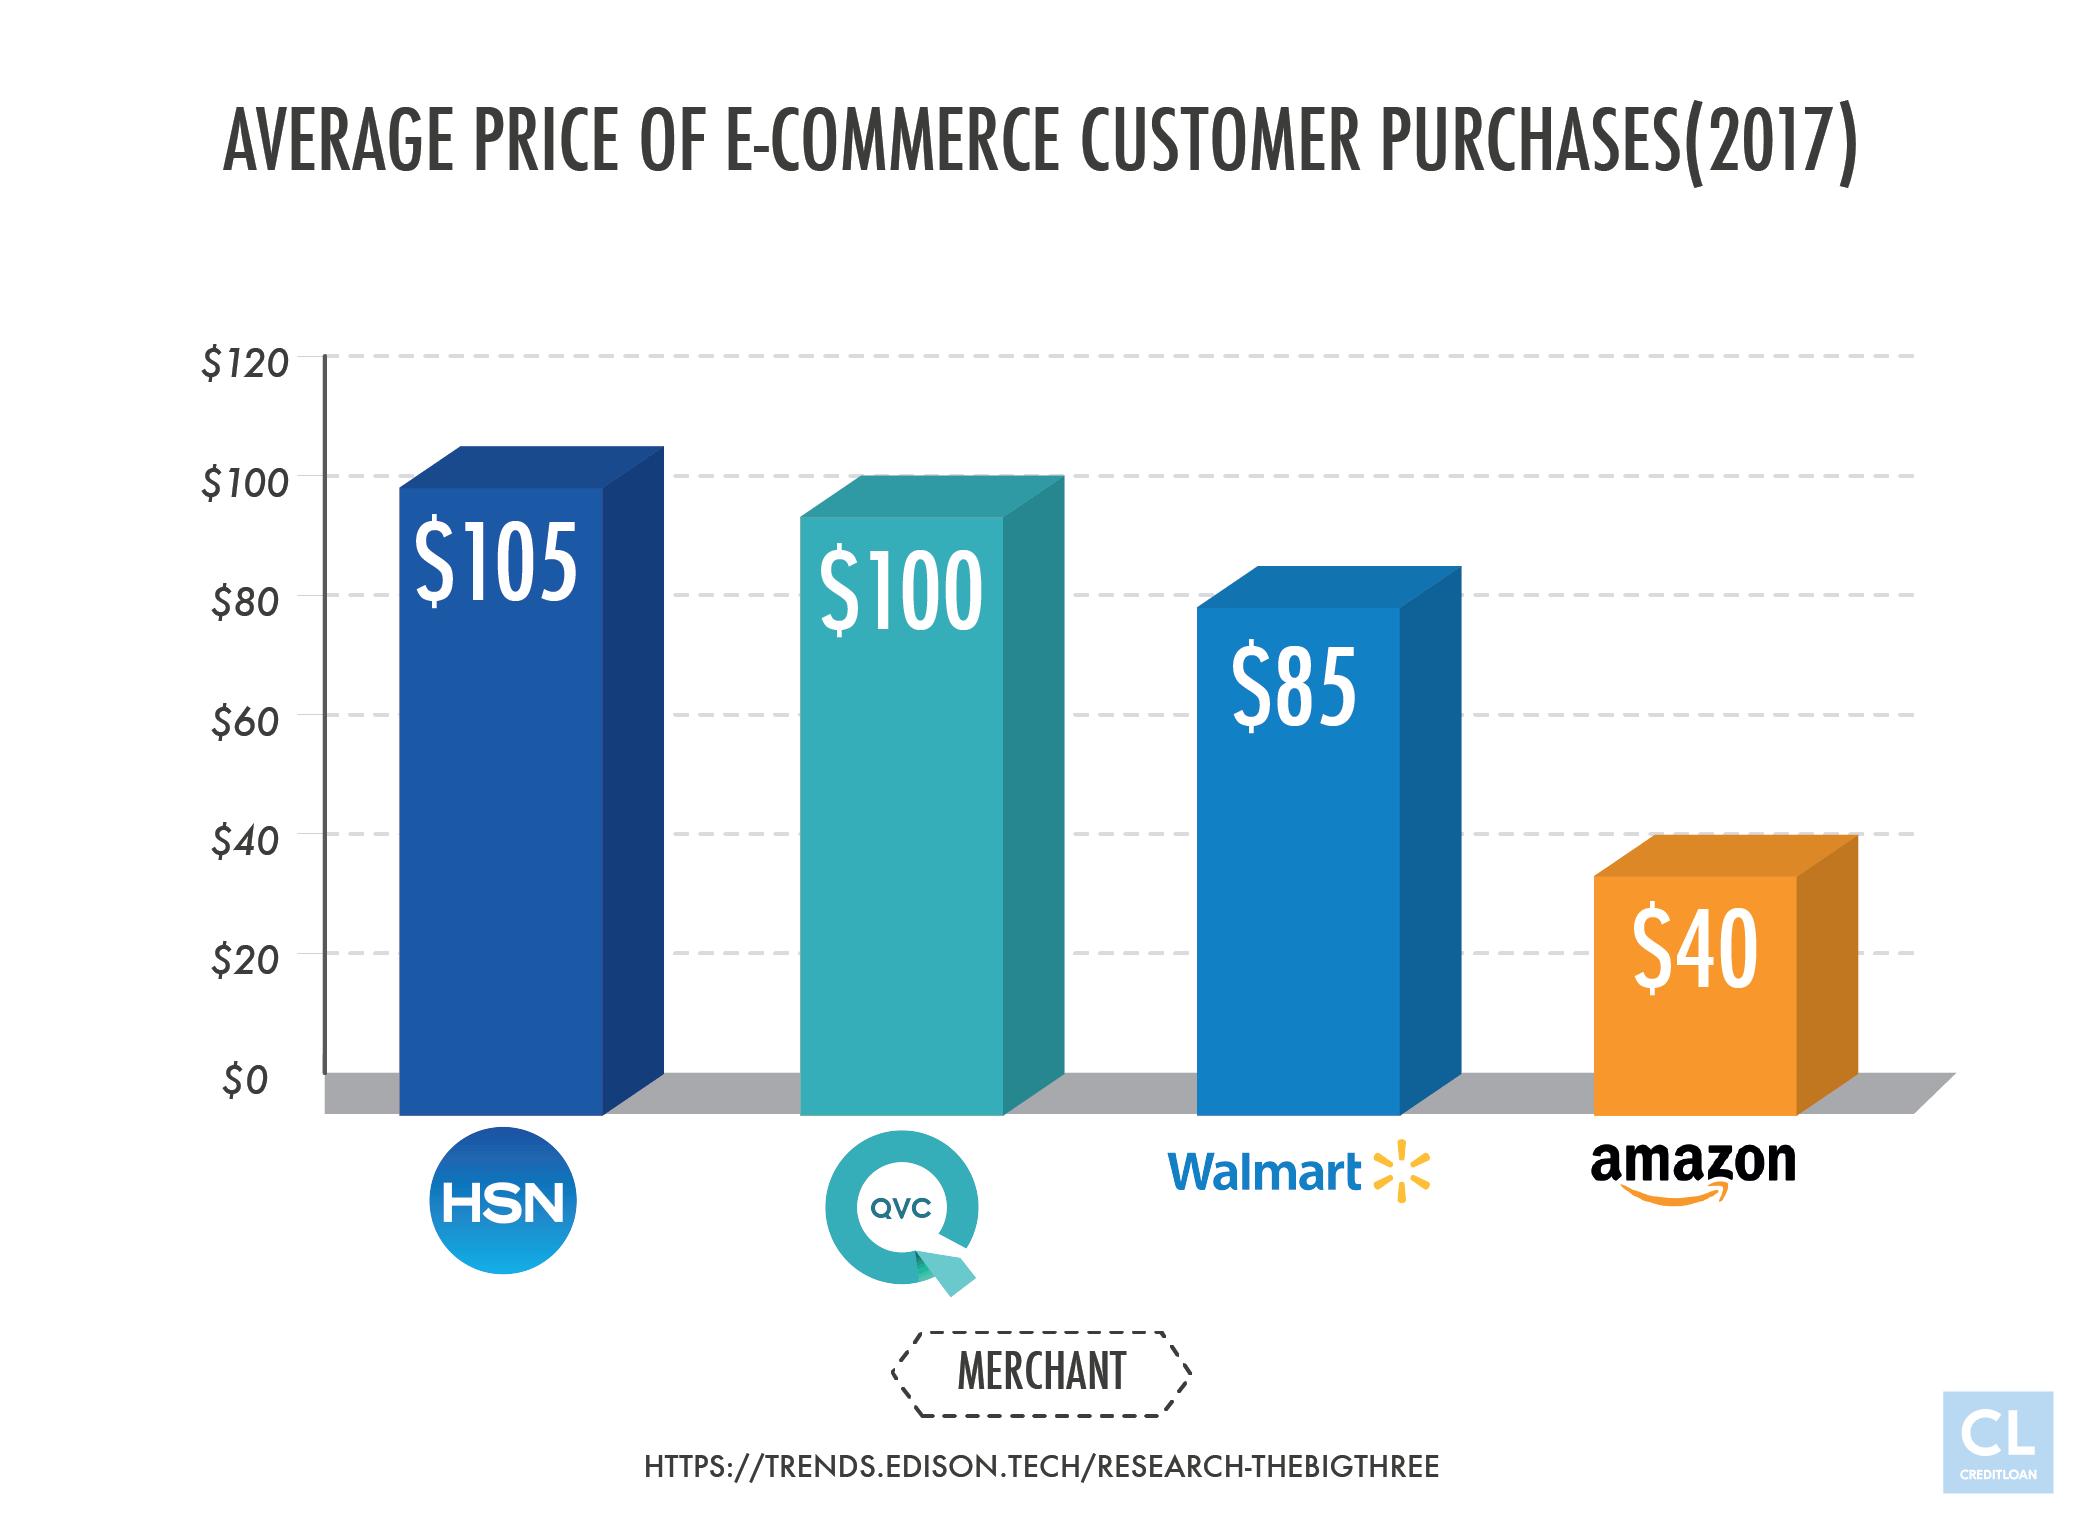 Average Price of E-commerce Customer Purchases(2017)